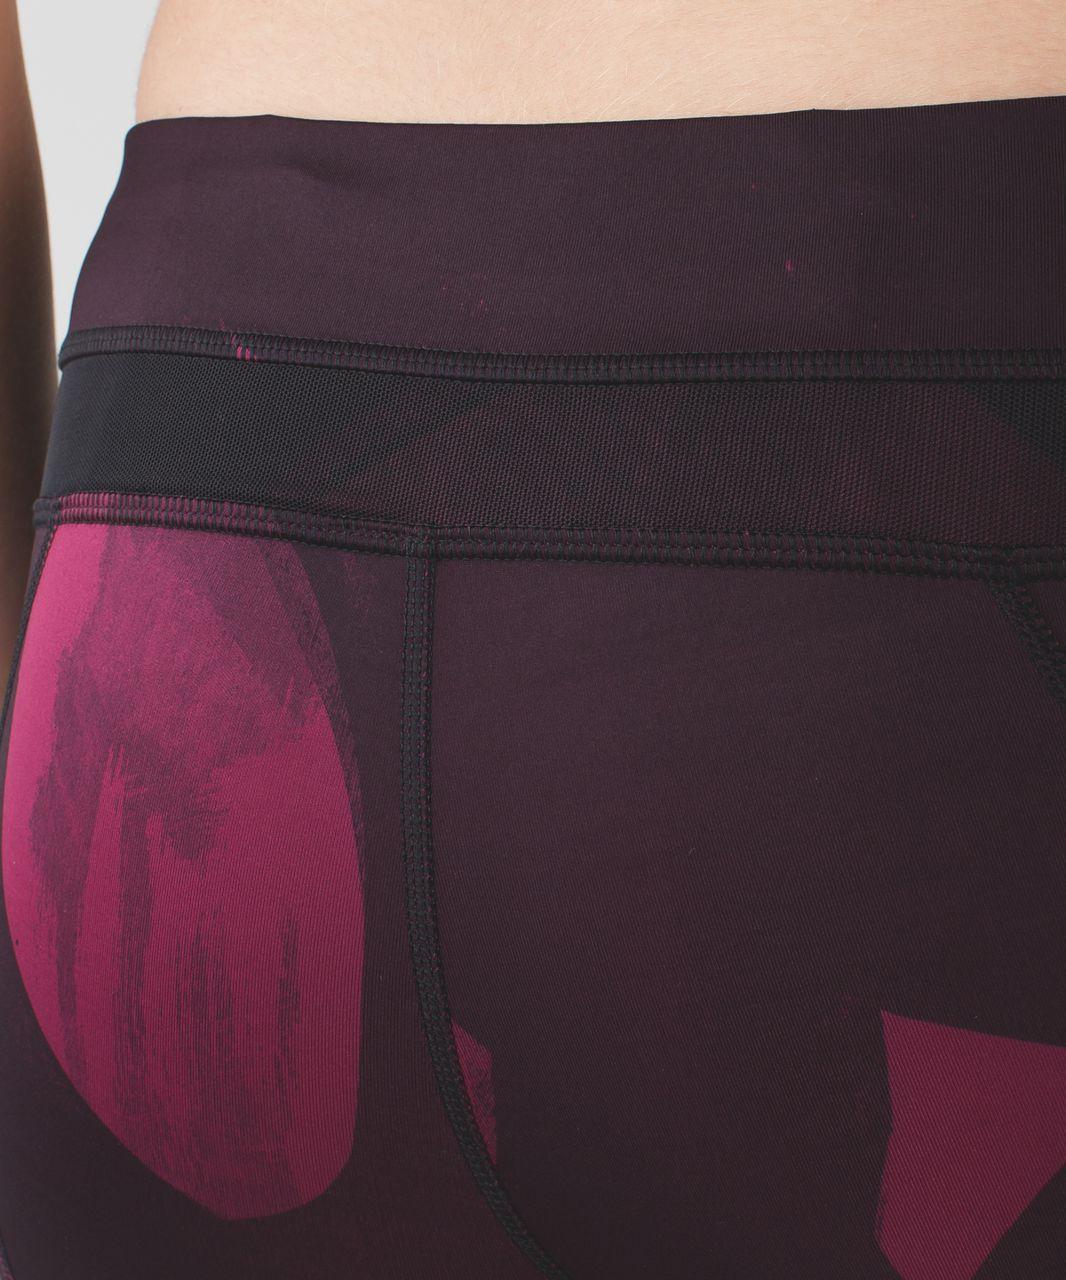 Lululemon Inspire Tight II - Back Spin Stroke Dashing Purple Black / Black